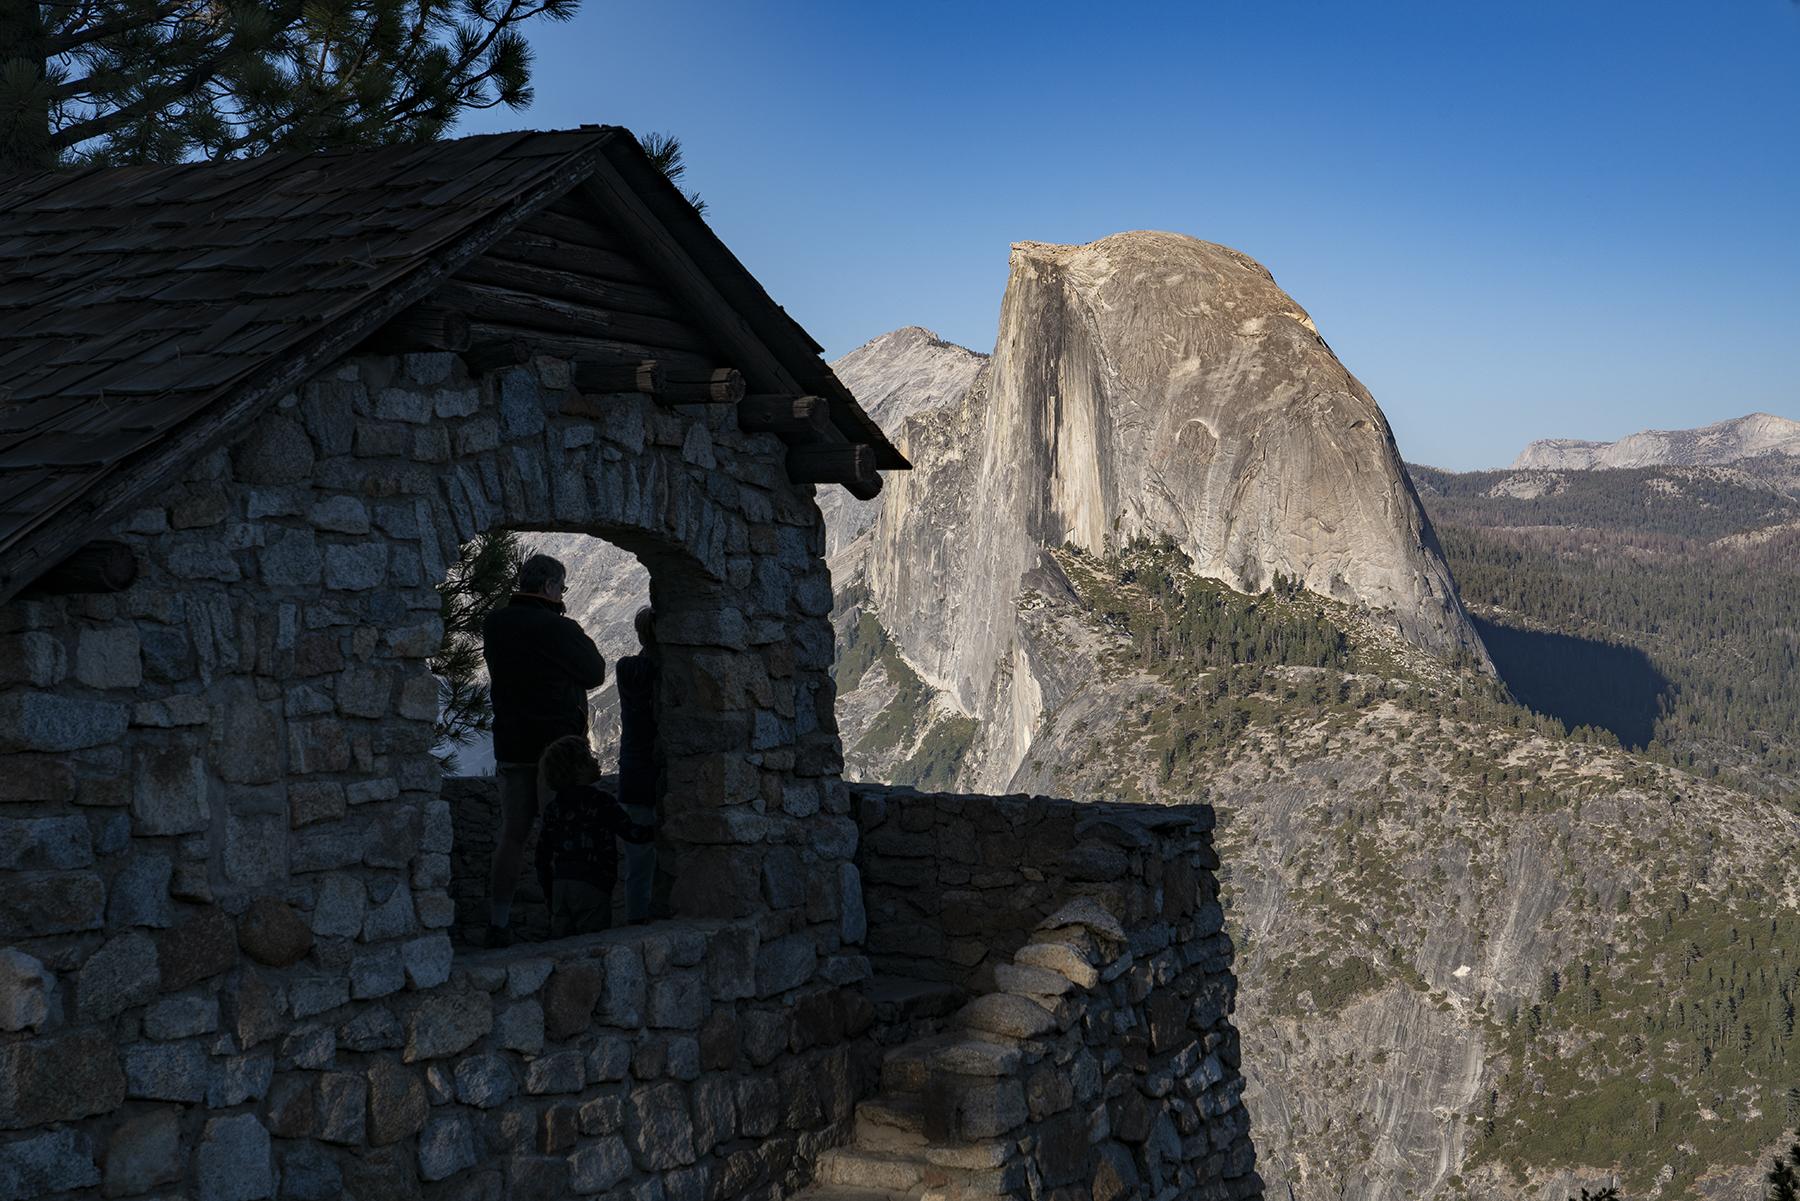 Observing Half Dome